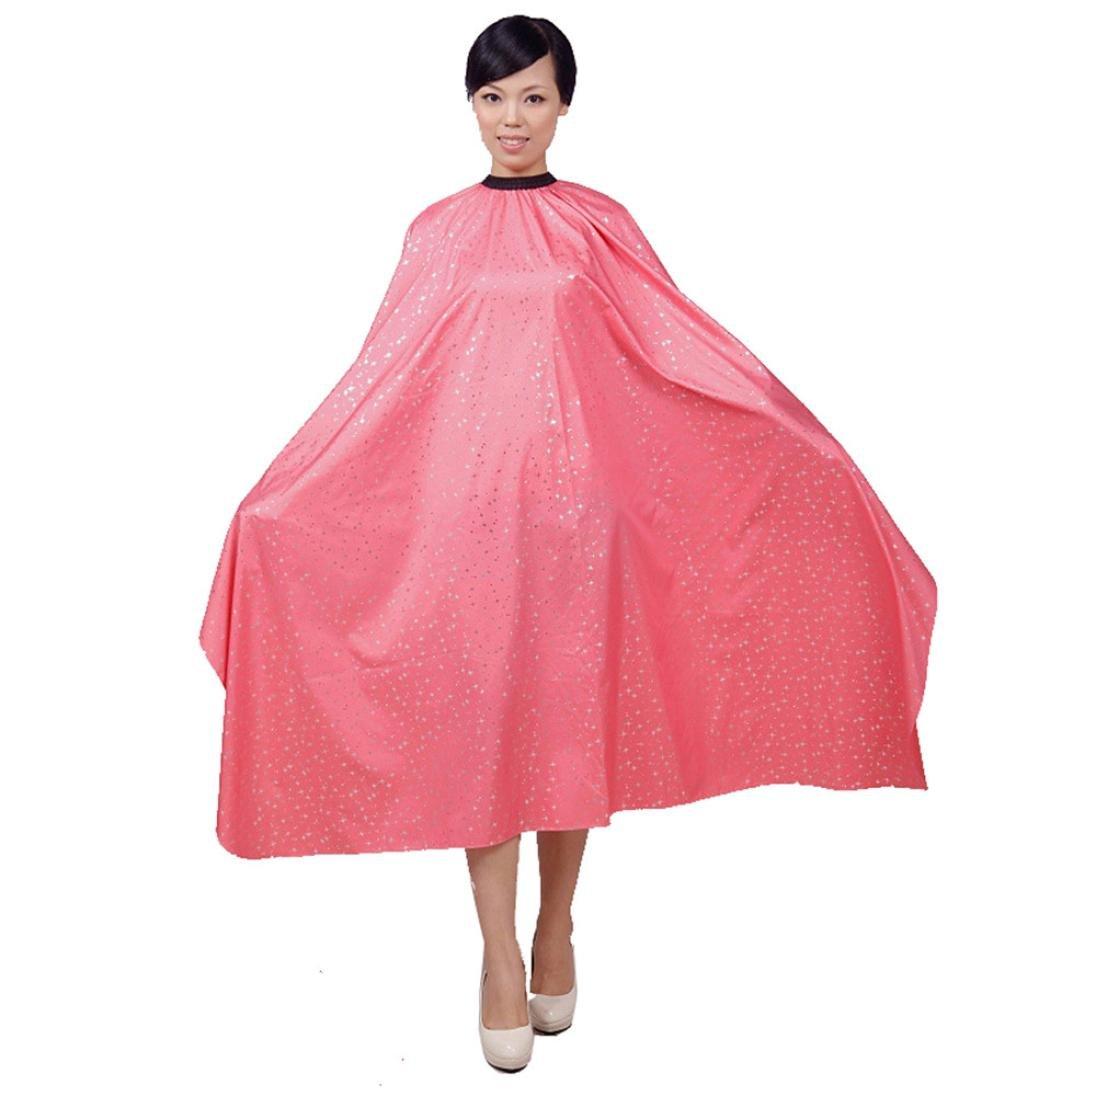 hunpta Cutting Hair Waterproof Cloth Salon Star Barber Gown Cape Hairdressing Hairdresser